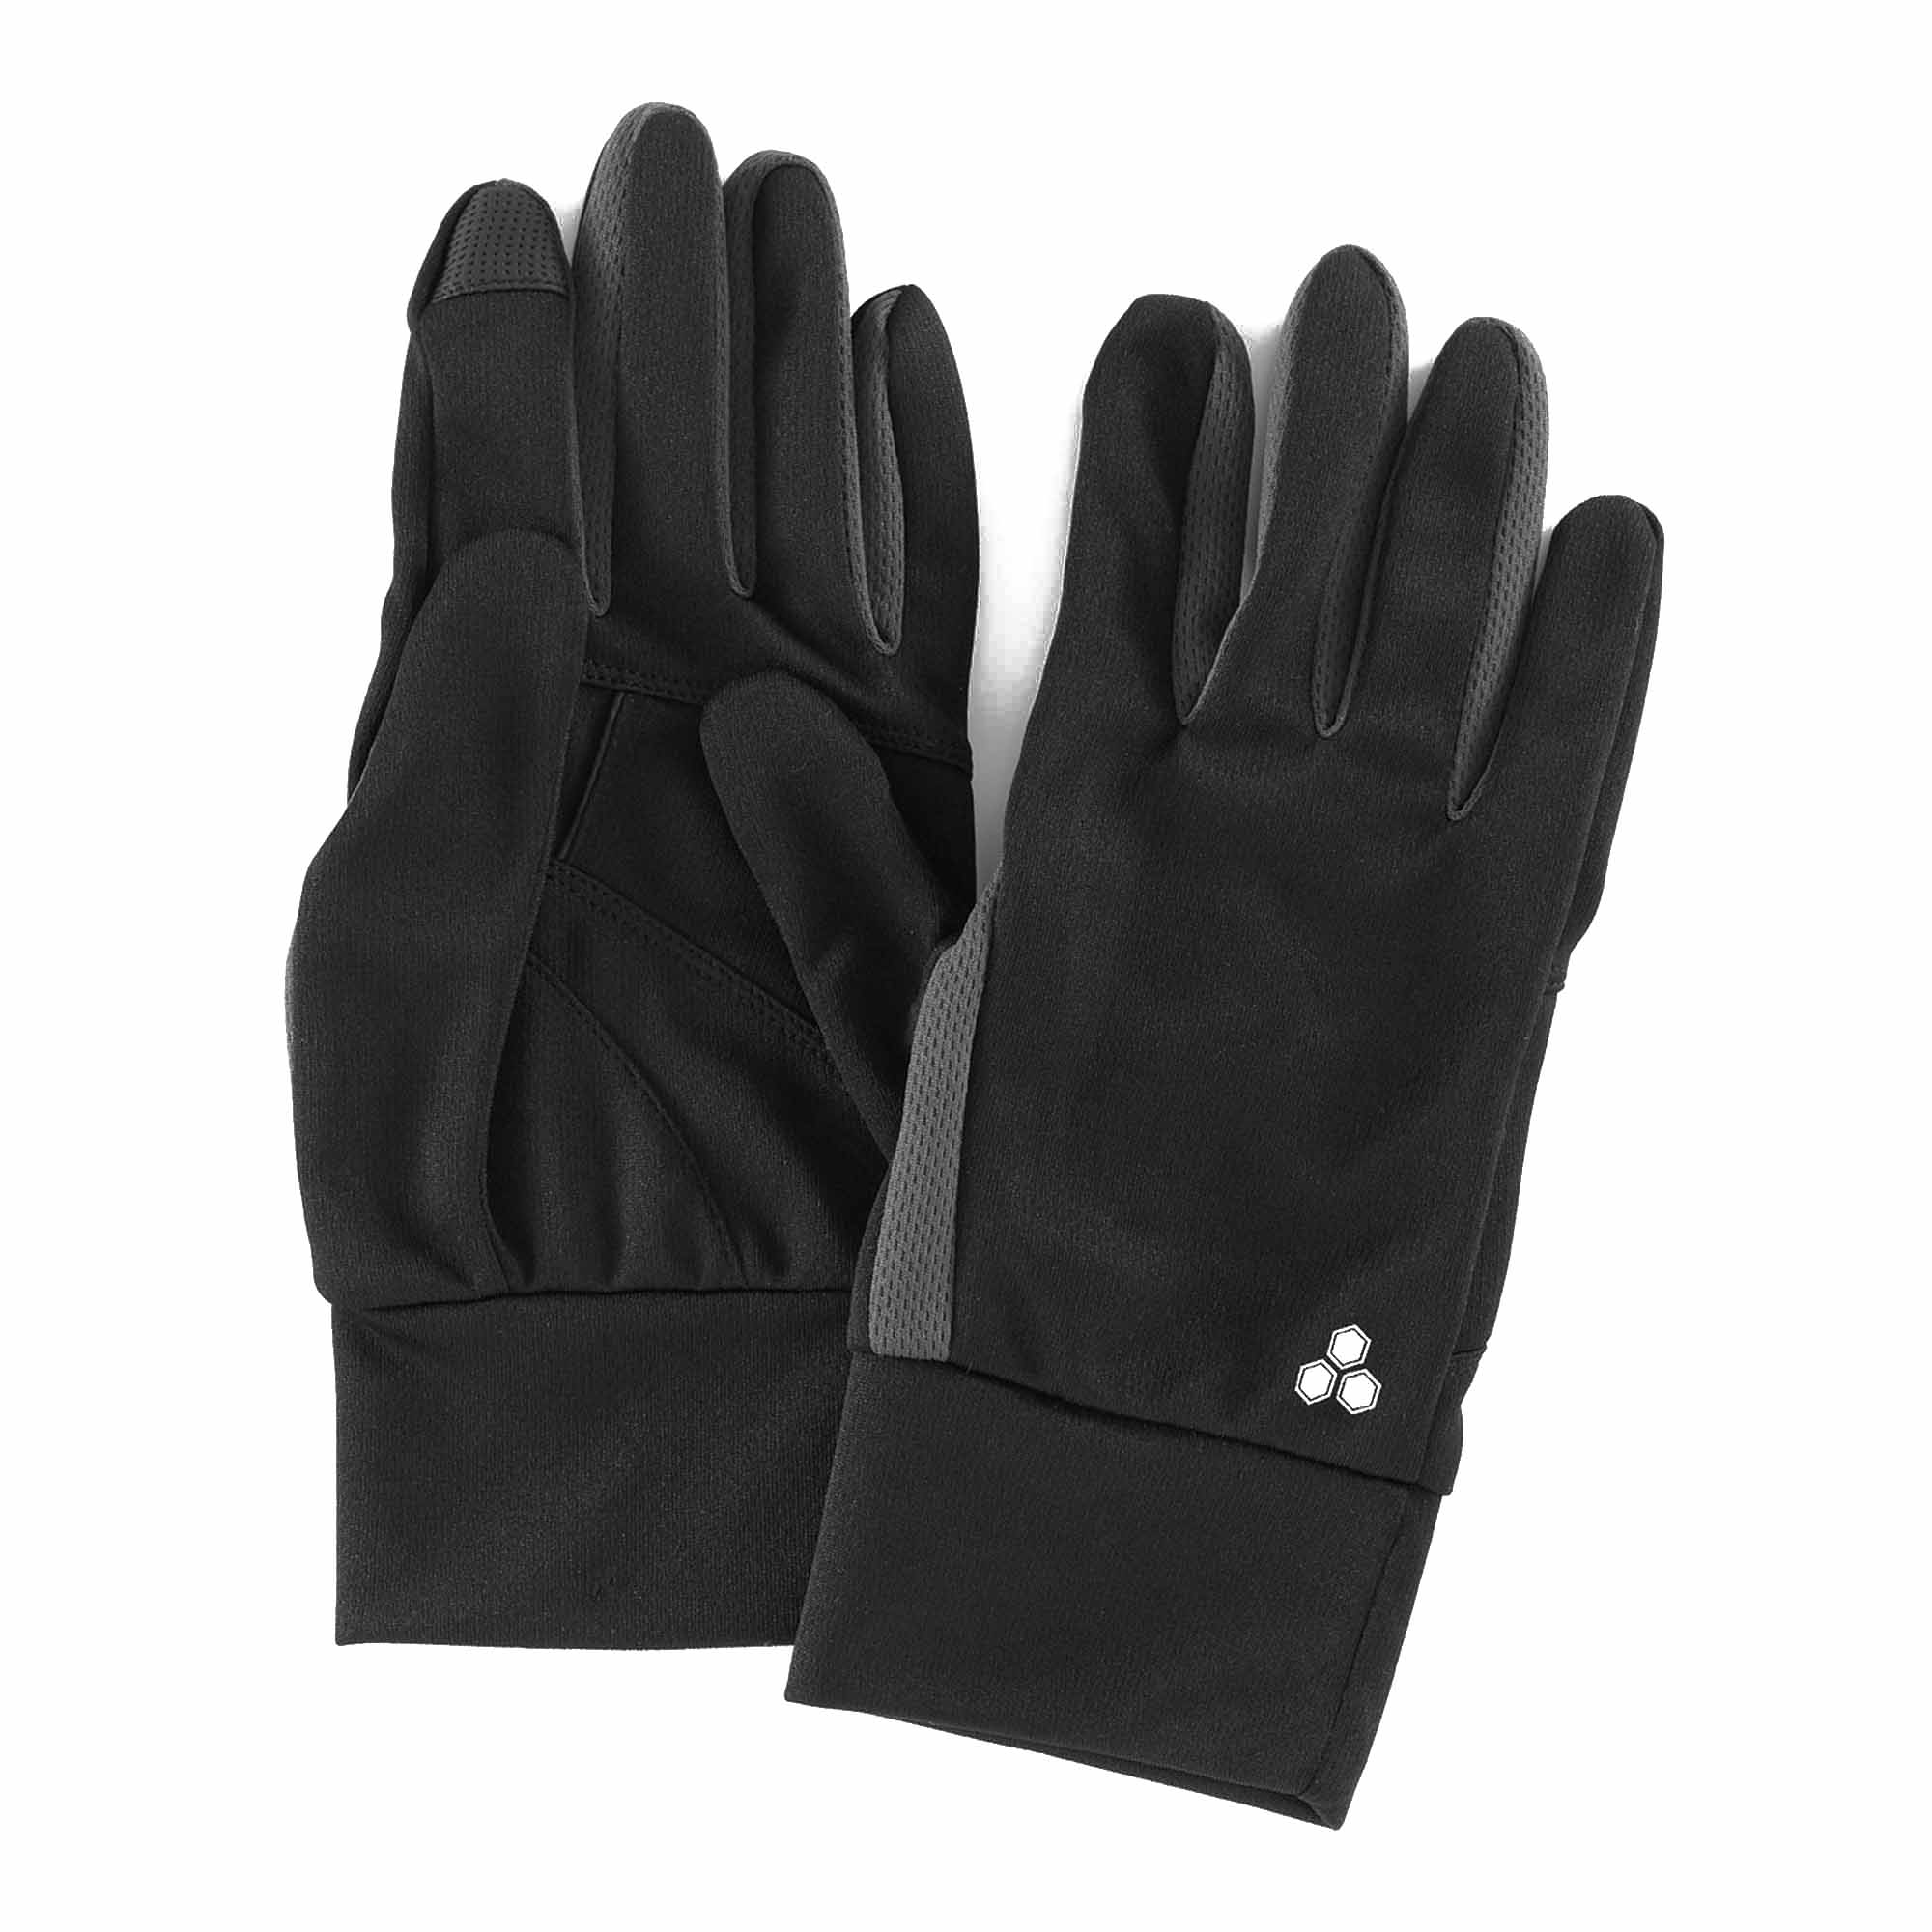 Nike Gloves Key Pocket: Tek Gear Mens Lightweight Touchscreen Key Pocket Running